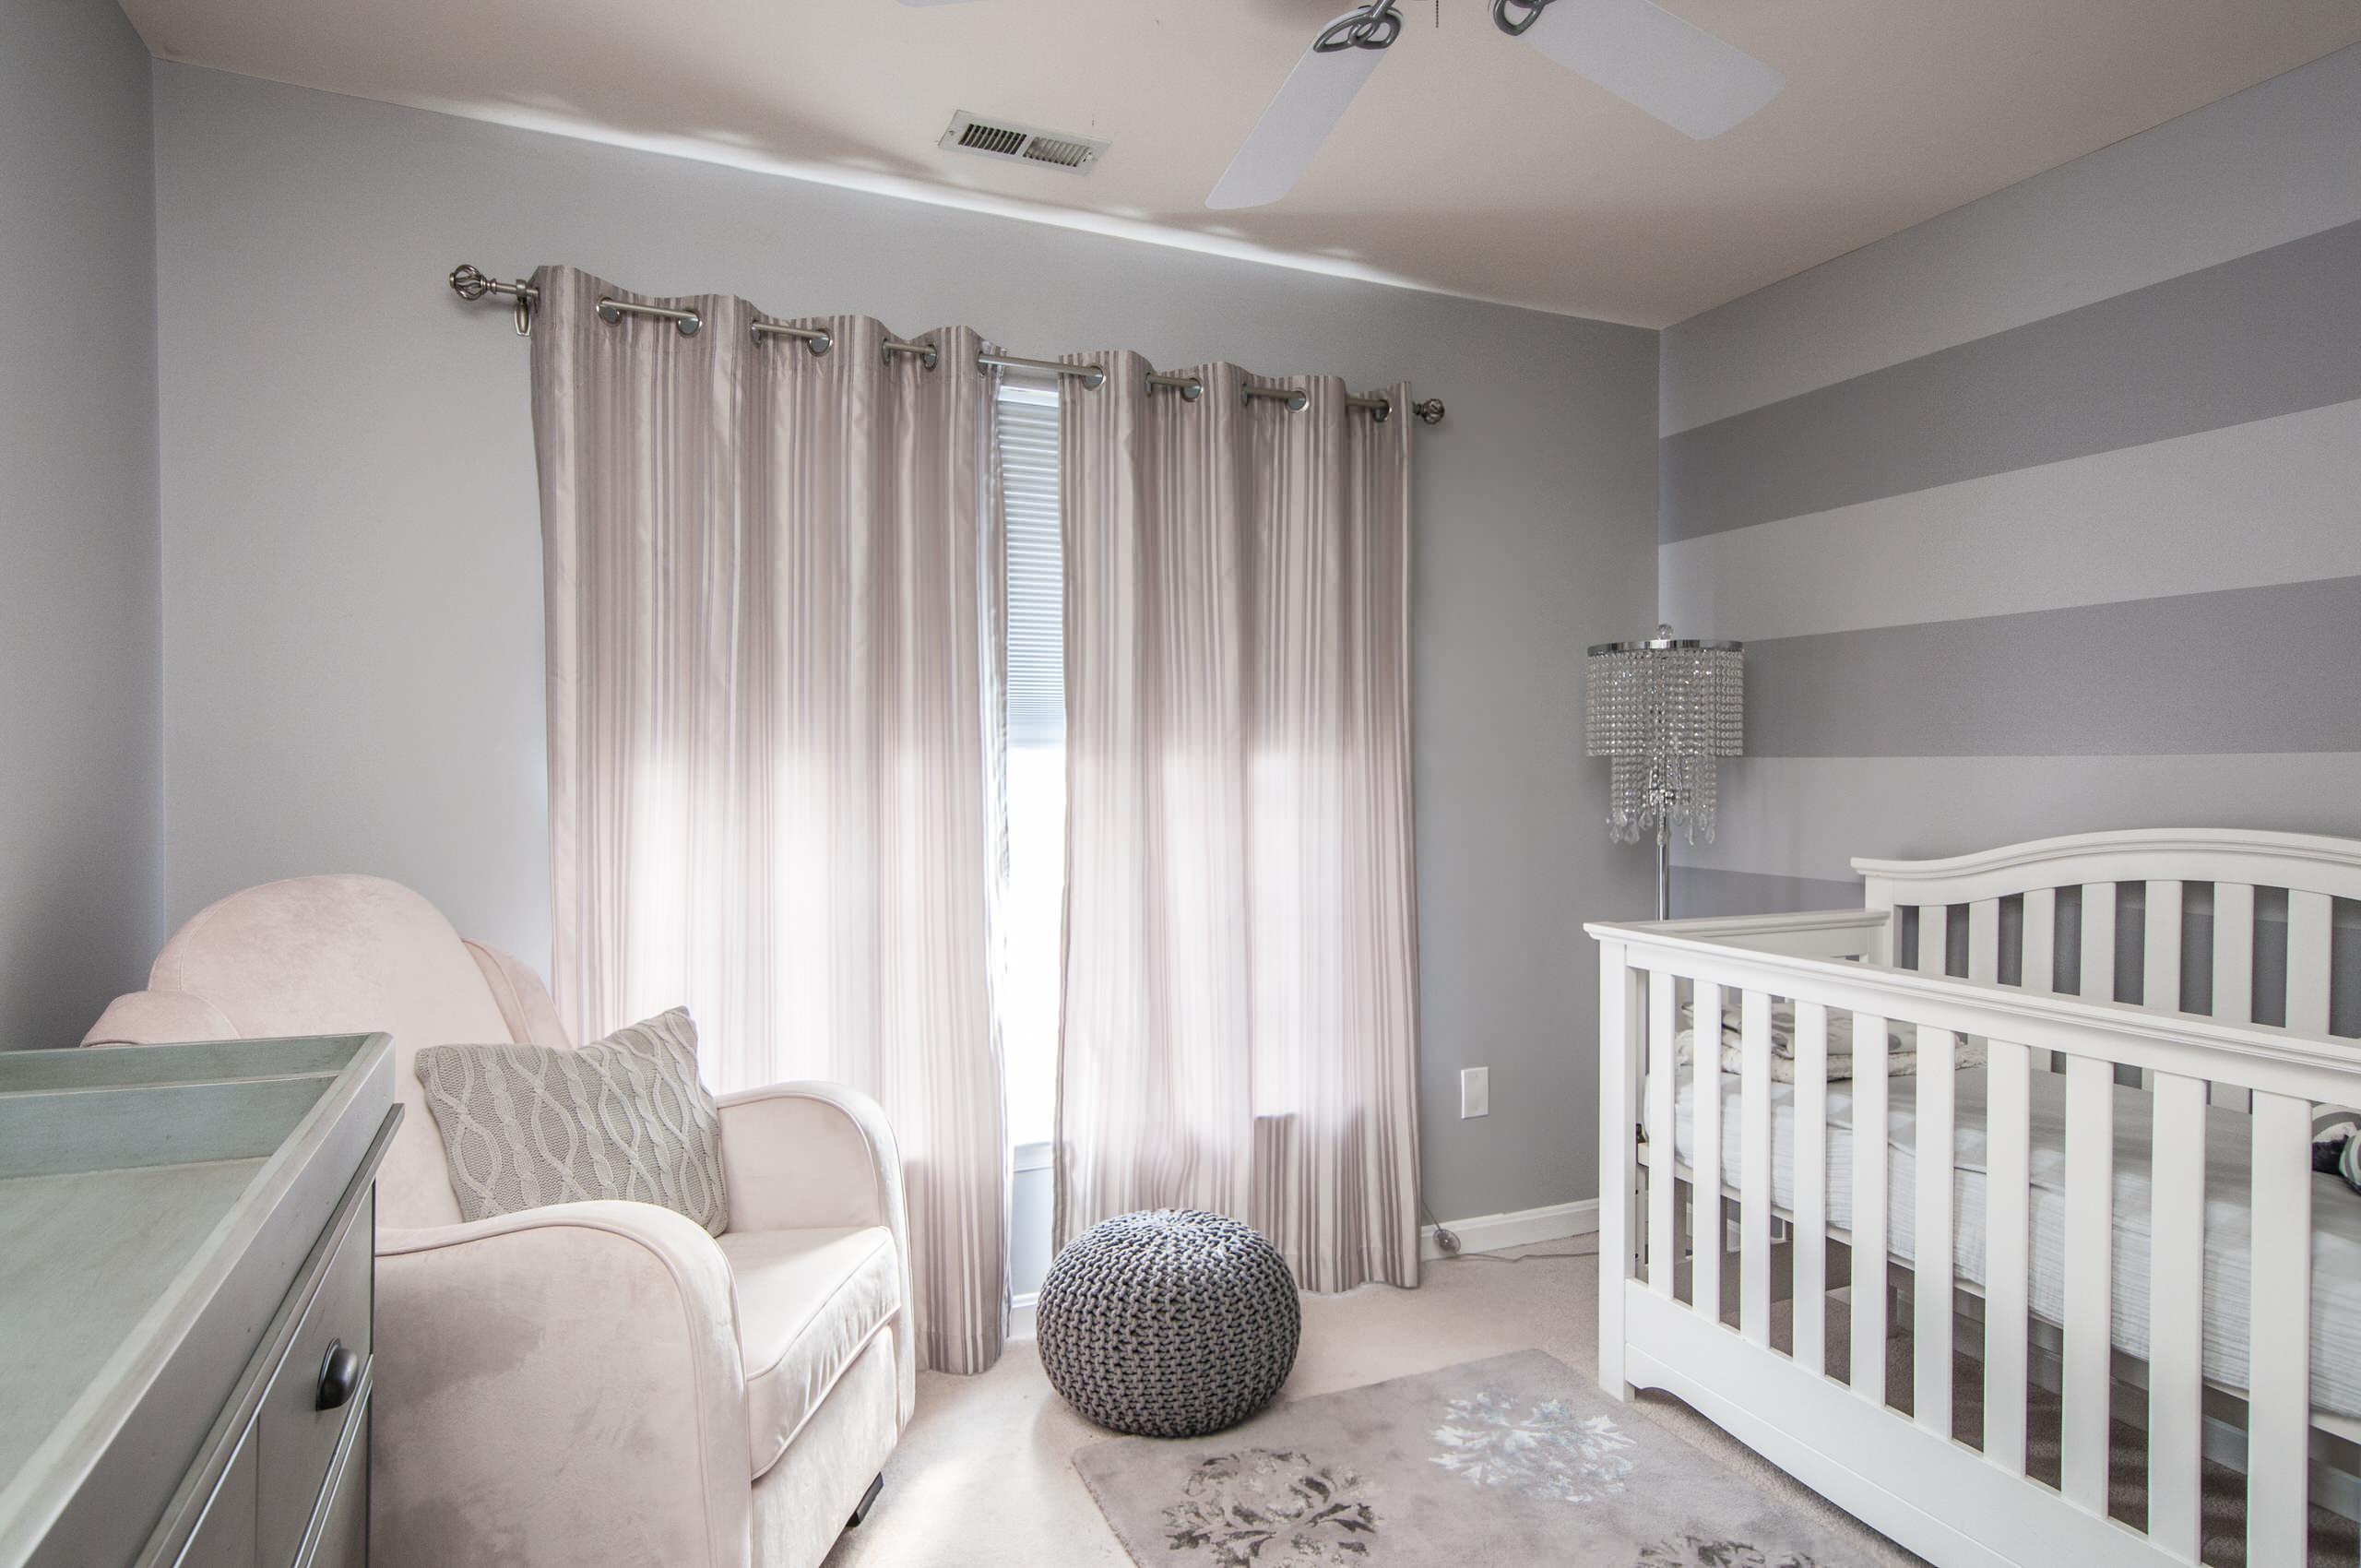 Nursery Pictures Ideas Color Gray